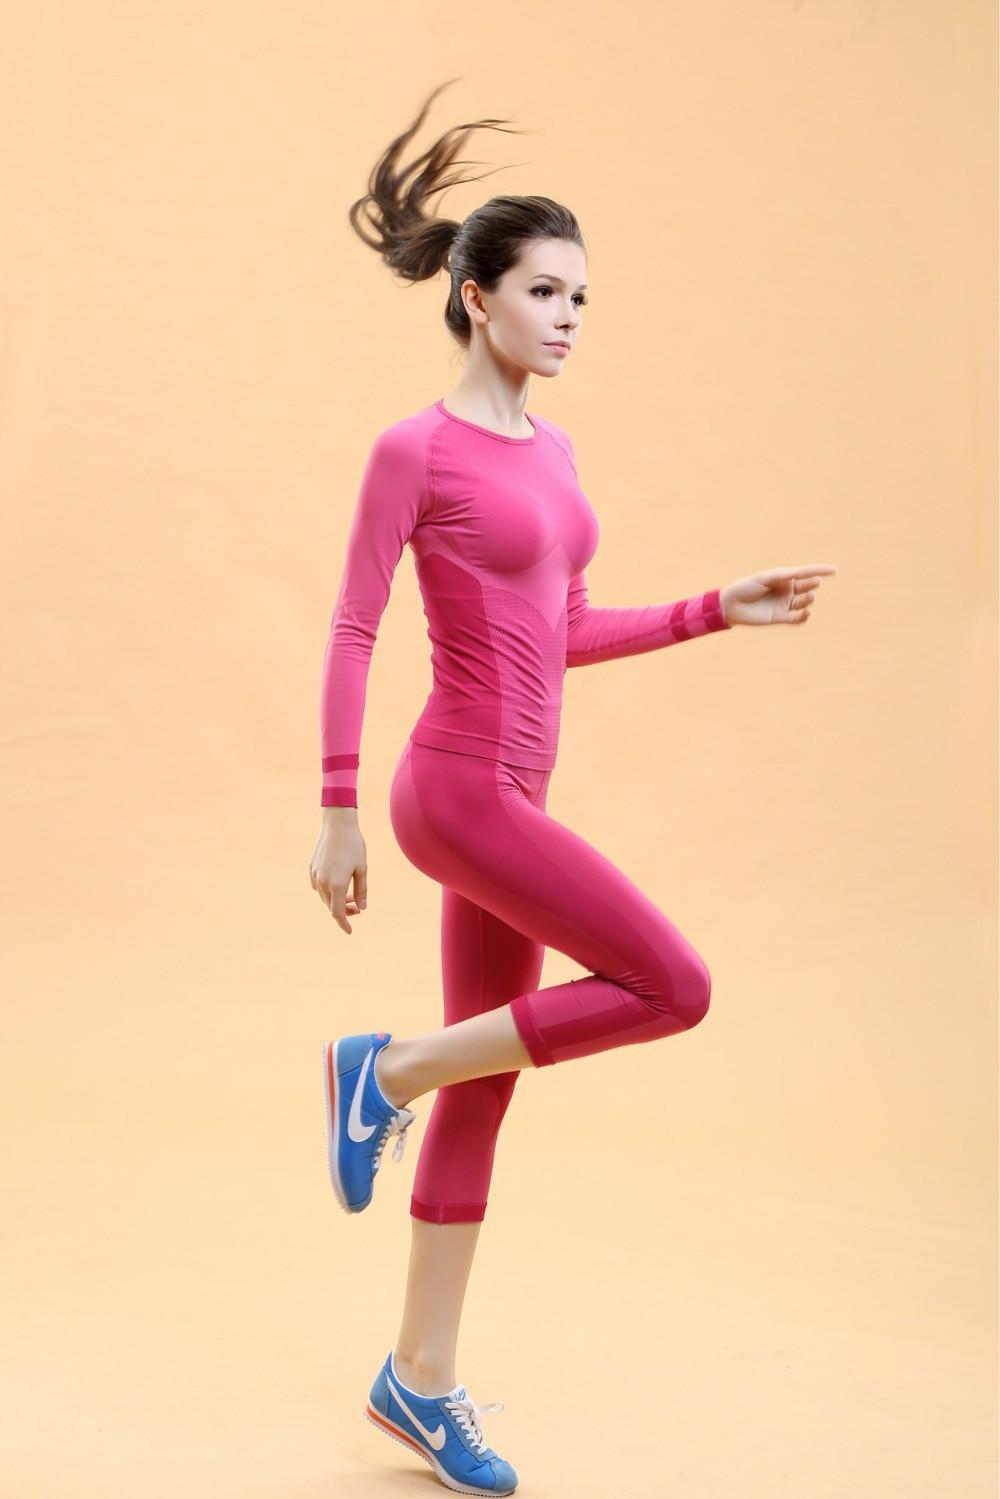 Professional Women Shorts Fitness Clothing Sport Suit For Female Yoga Elastic Gym Panties Exercise Running Slim Legging WA02